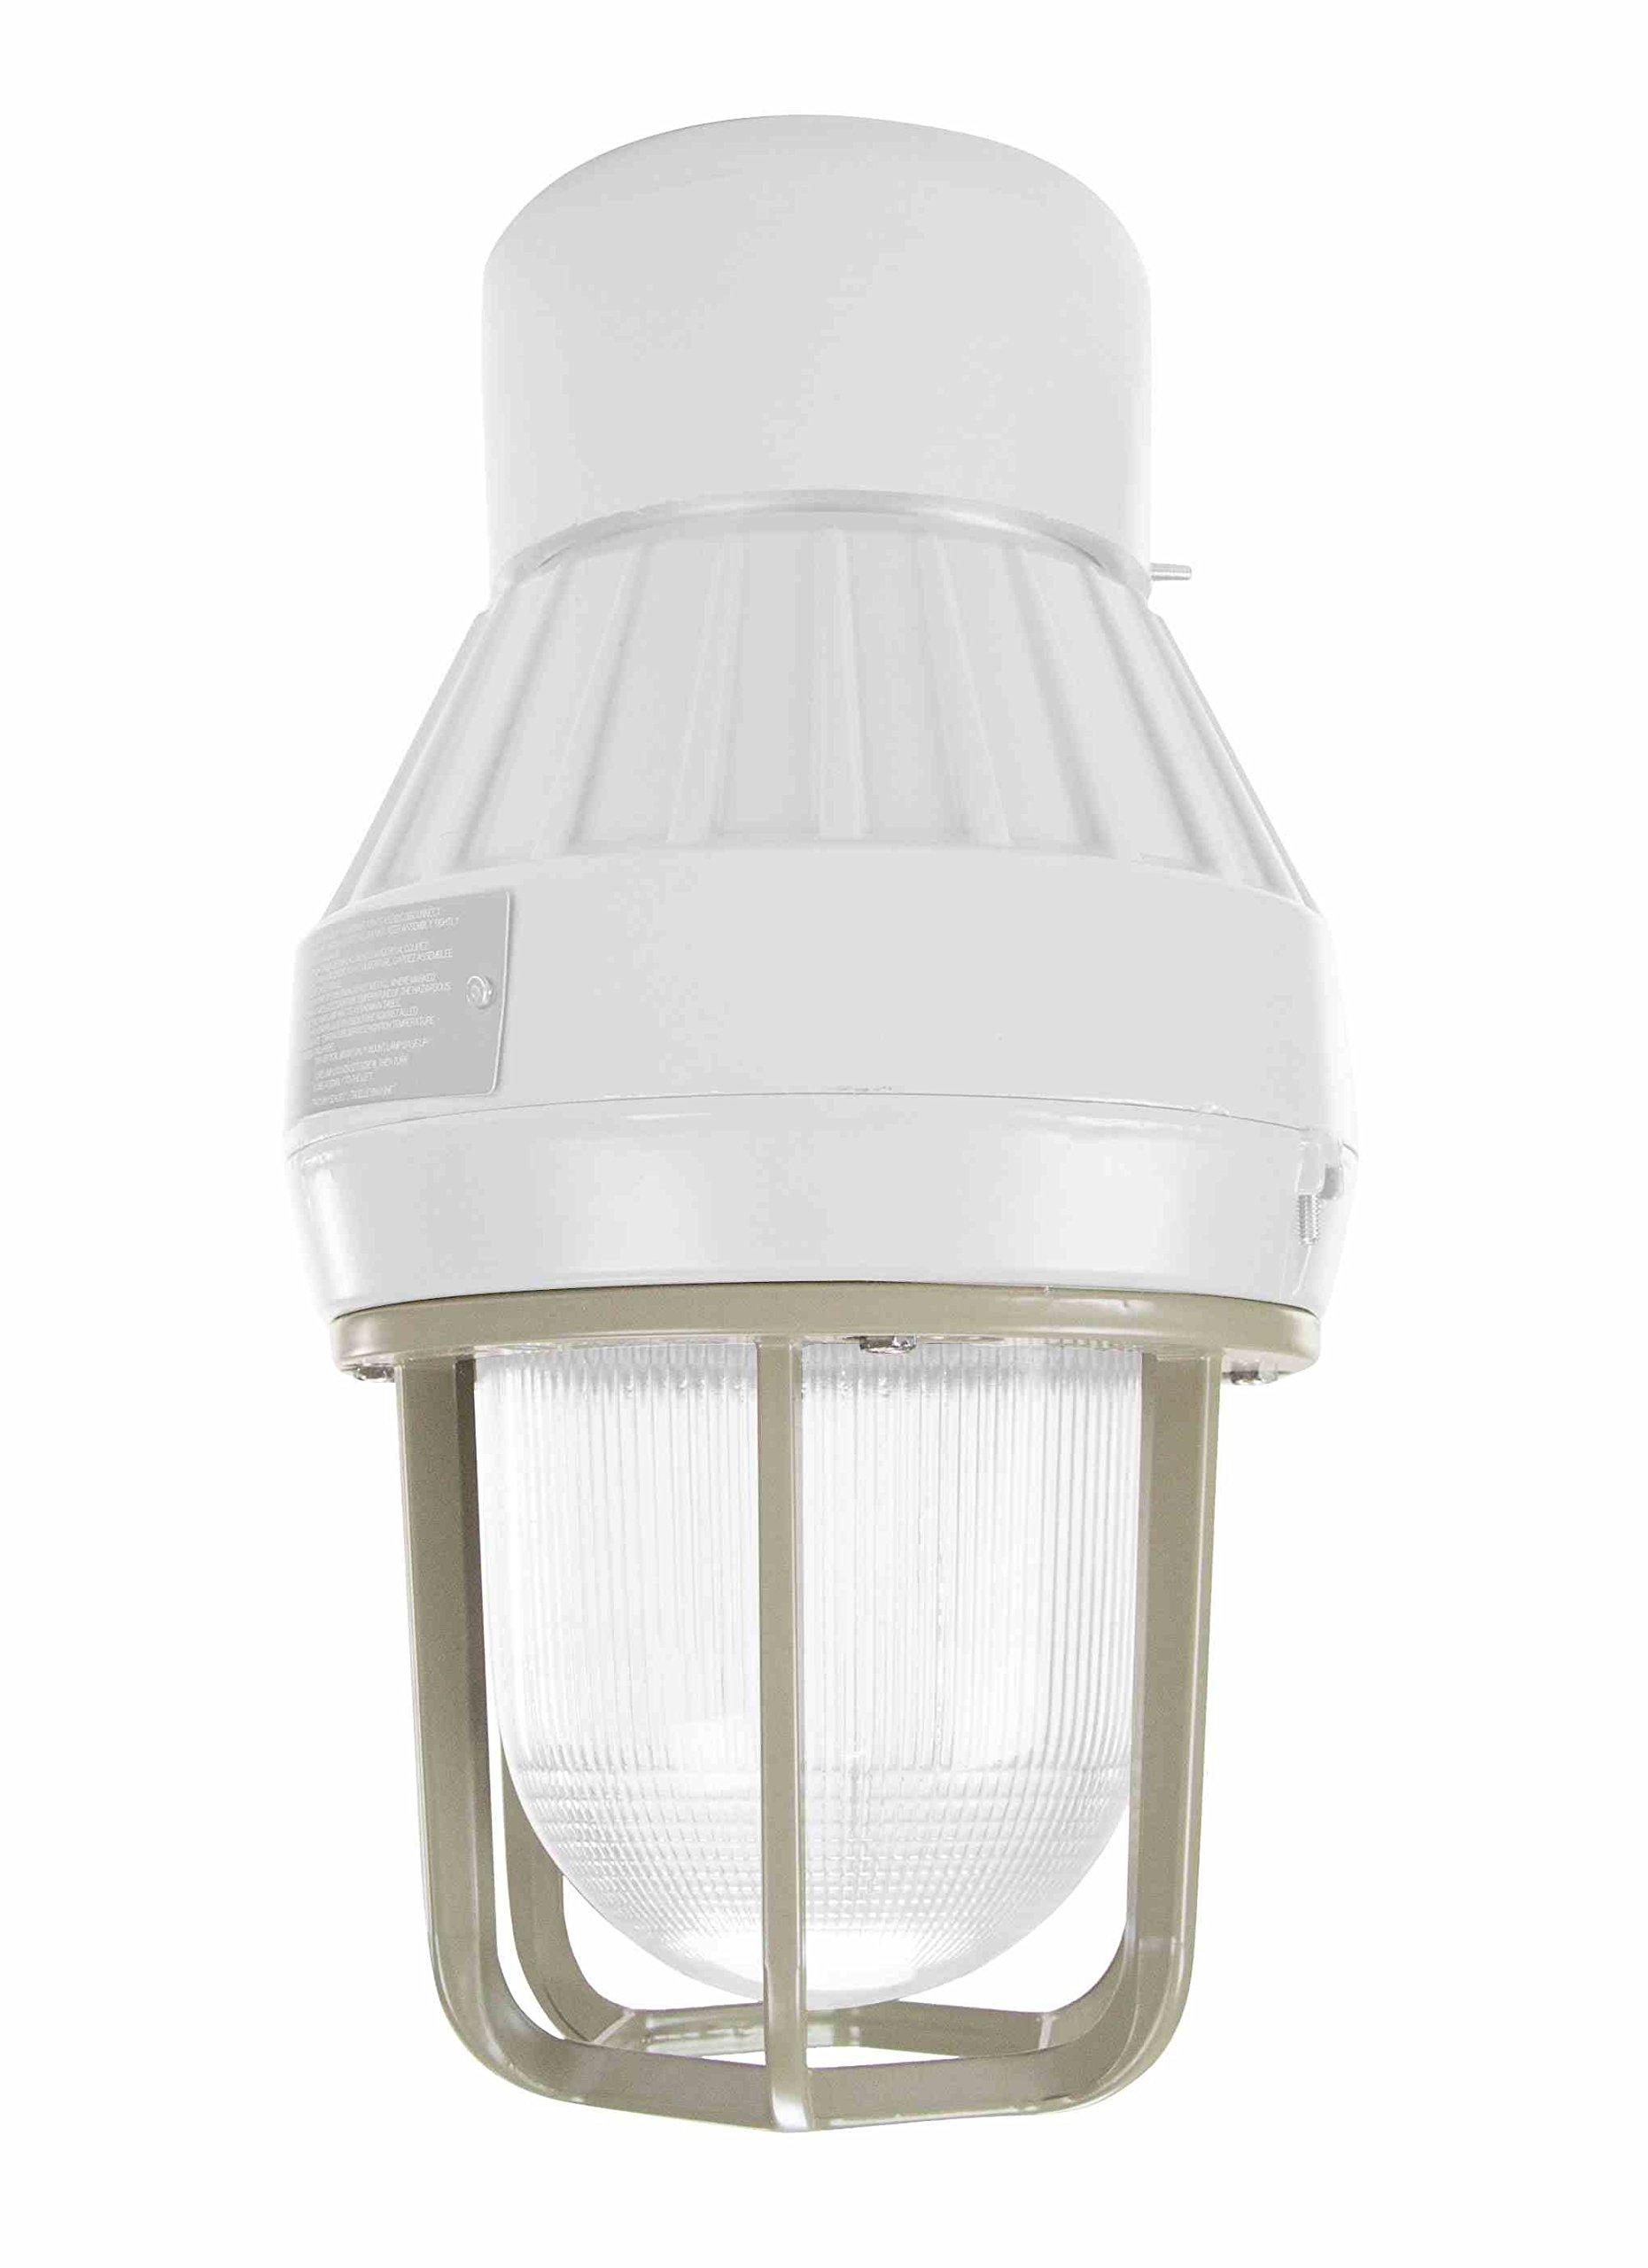 Larson Electronics 1218OXN3QM4 Pendant Mount Kit for Epsl-80-141 Series of LED Explosion Proof Strobe Lights